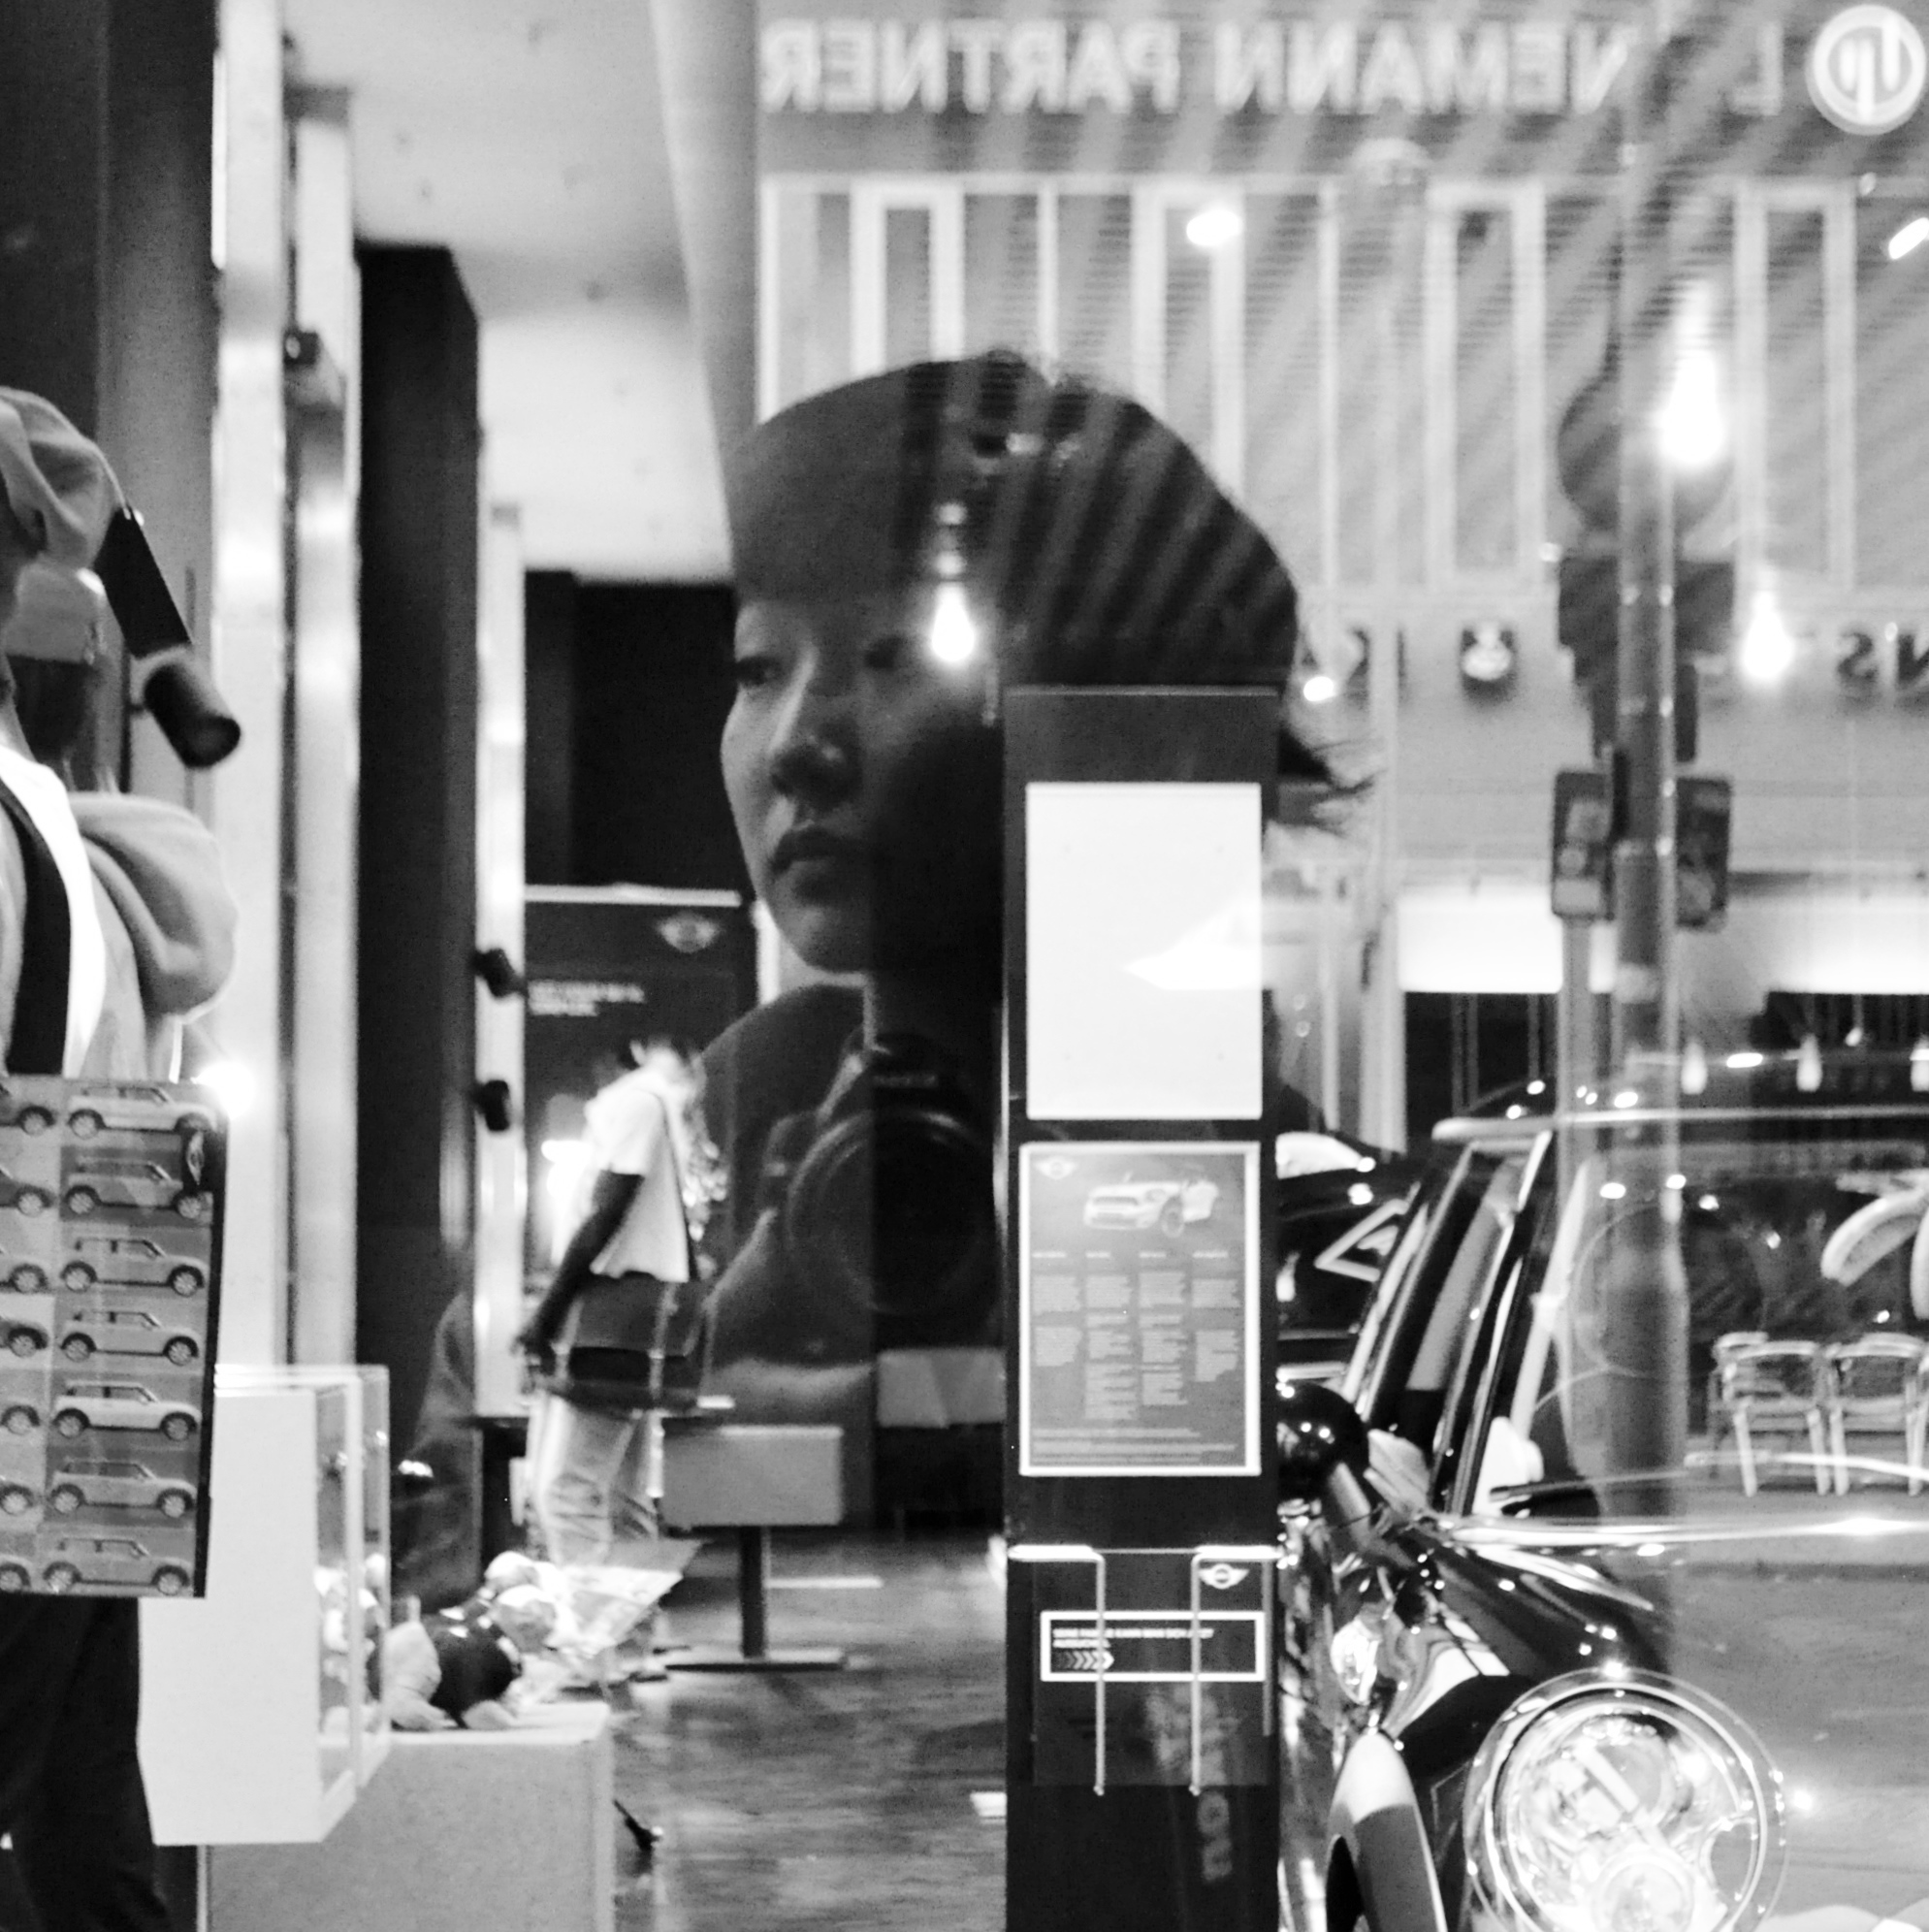 Mini Cooper store by Stadtmitte.JPG